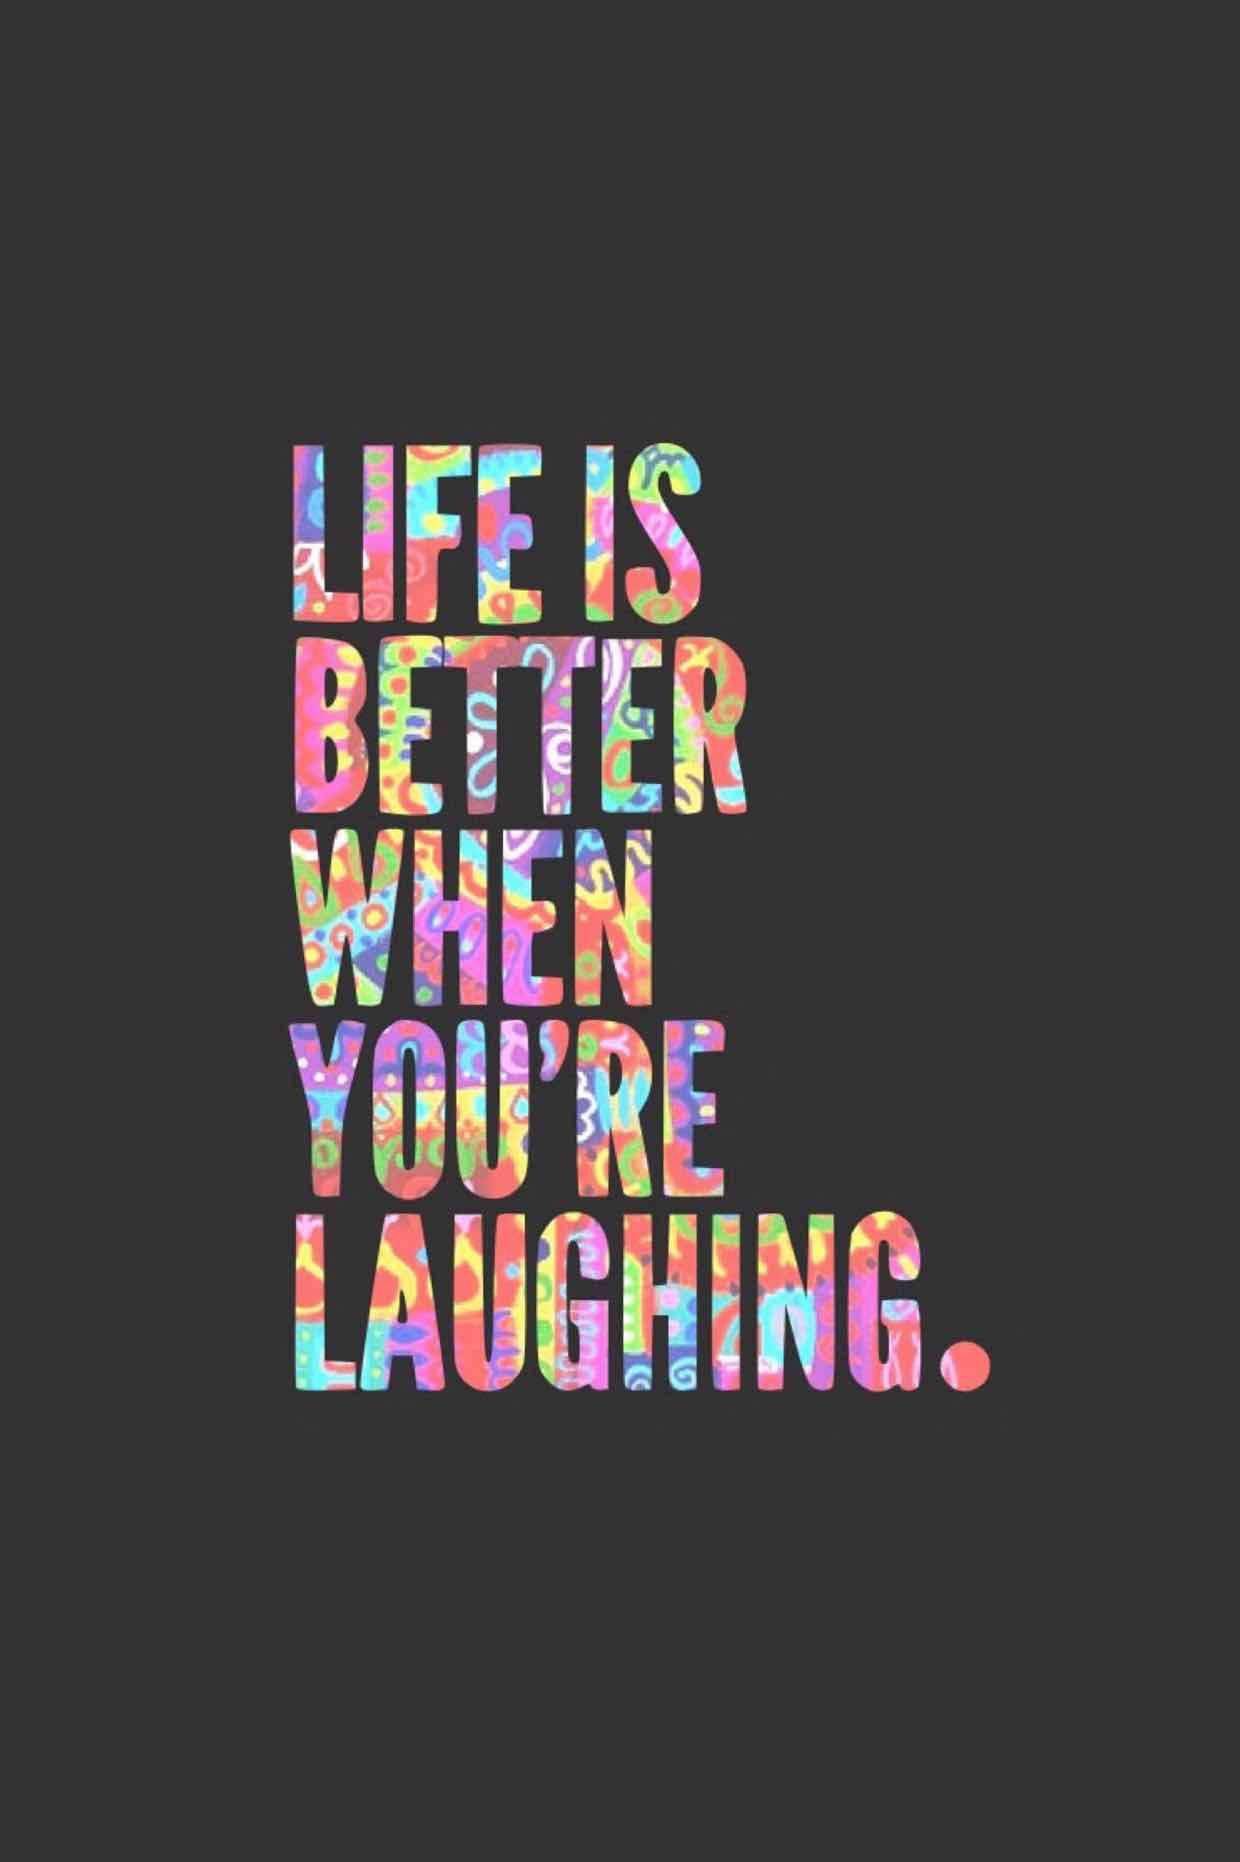 Quotes Laughing quotes, Instagram quotes, Caption quotes